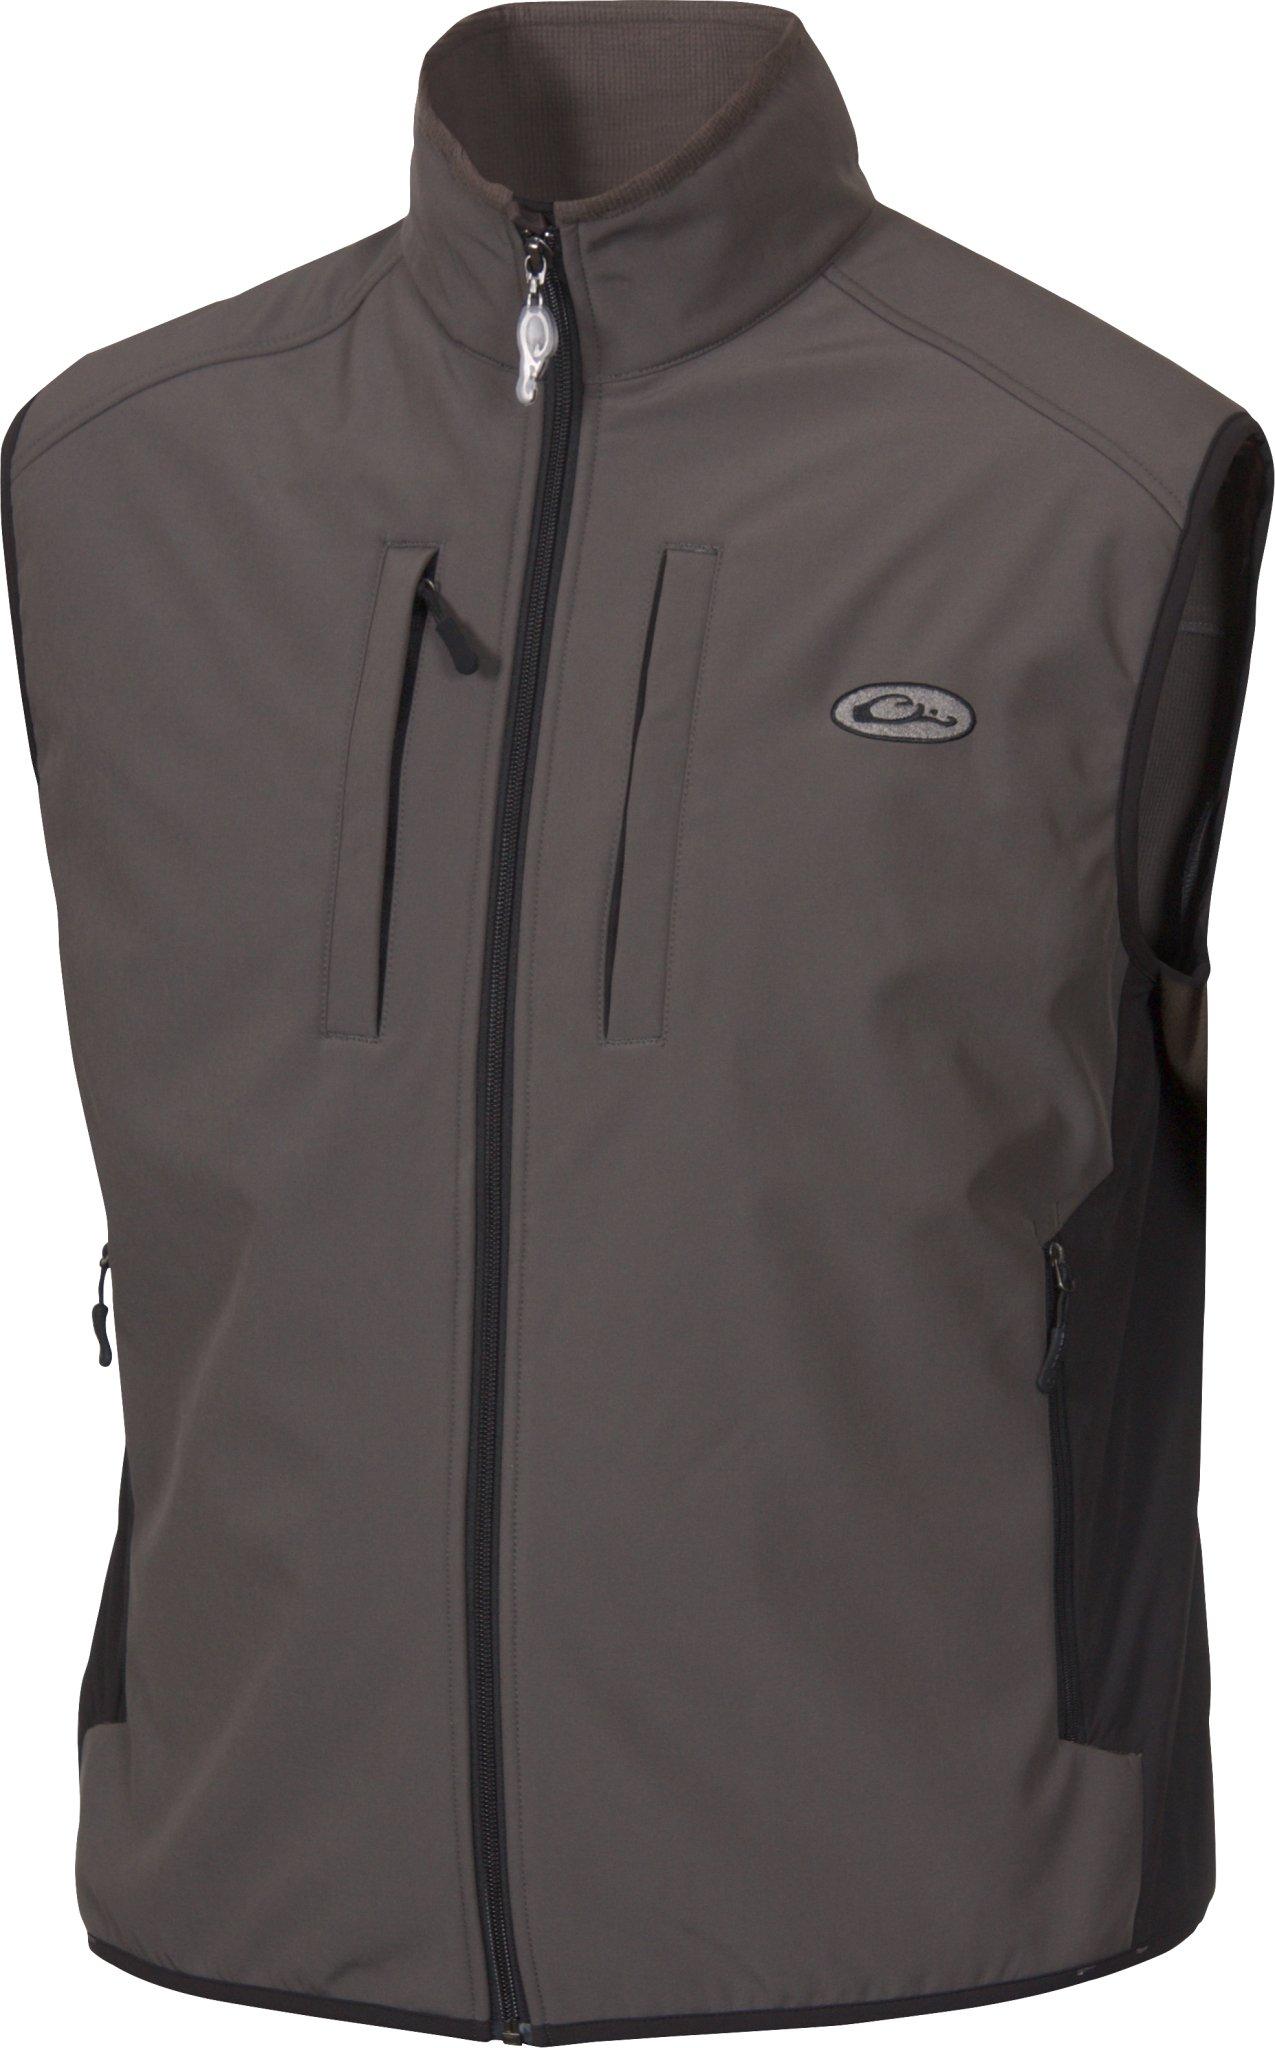 Drake Windproof Tech Gray Vest, Large by Drake